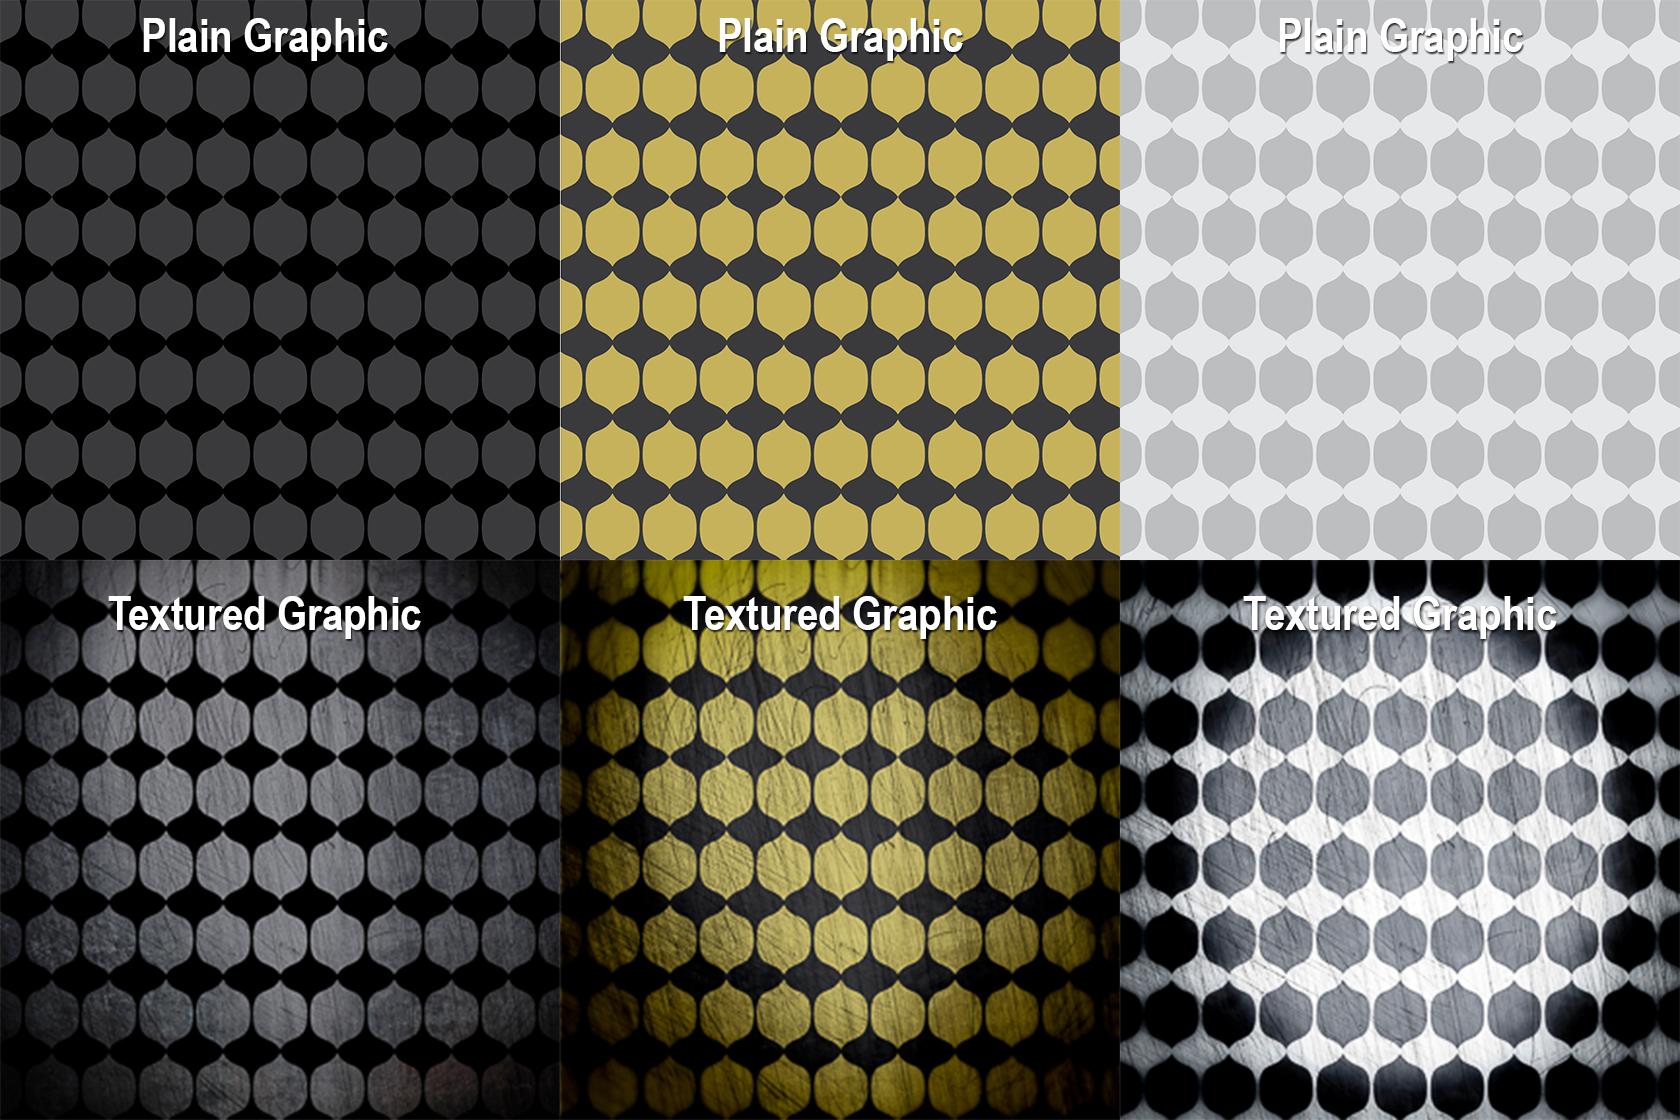 Stephen Coppedge Photo Backgrounds1 Lightapalooza 2013: April Winners Announced